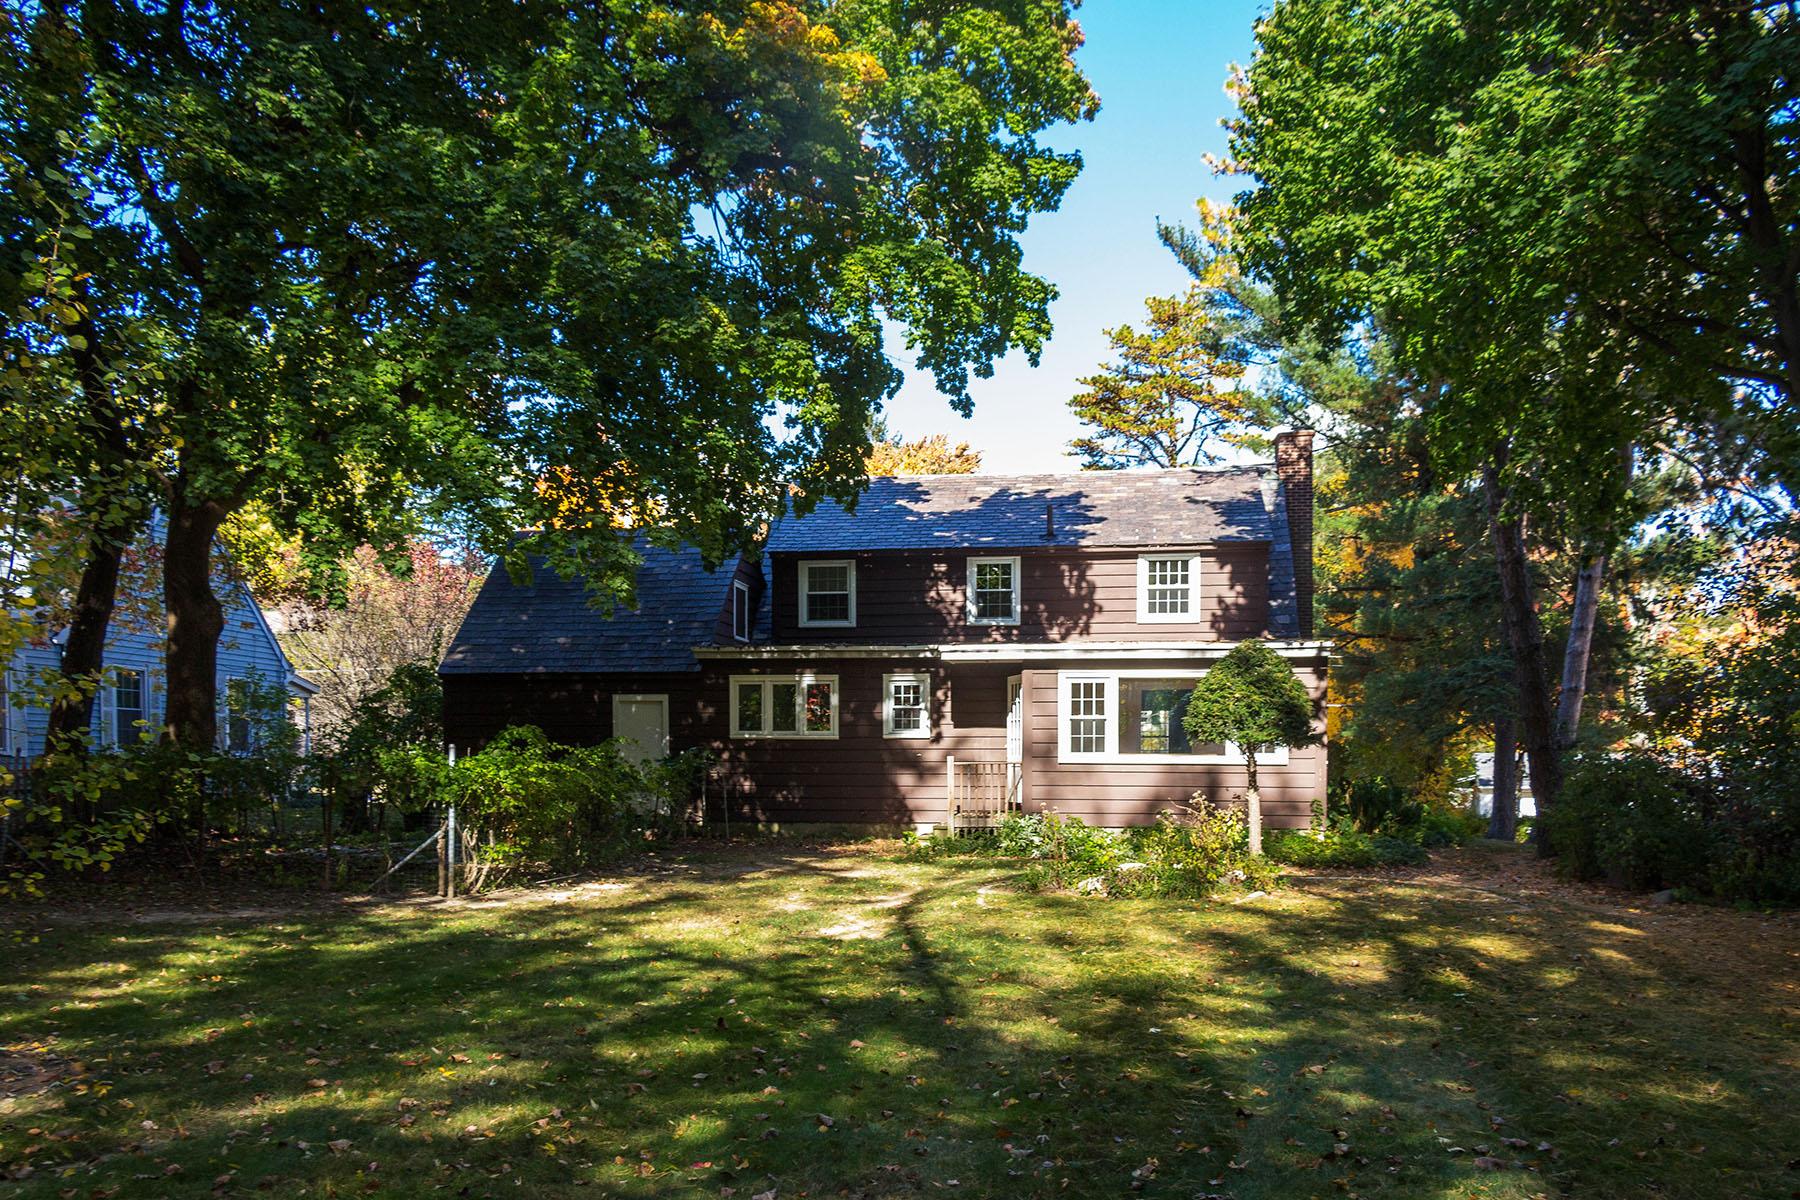 Single Family Home for Sale at Old Niskayuna 2176 Stuyvesant St Niskayuna, 12309 United States